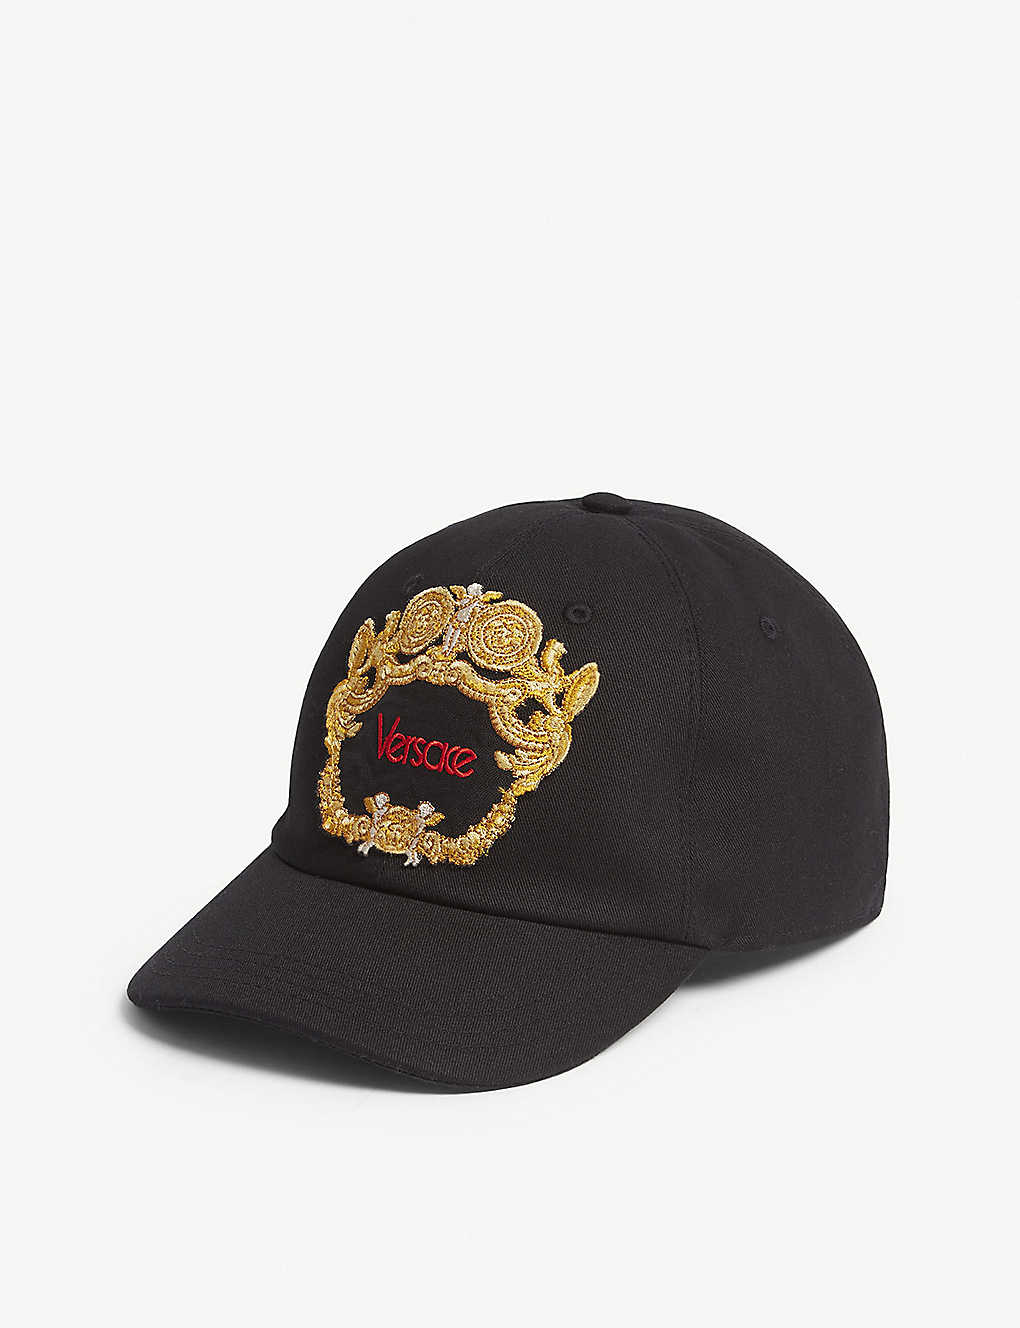 VERSACE - Framed logo cotton baseball cap  001dcee7f438